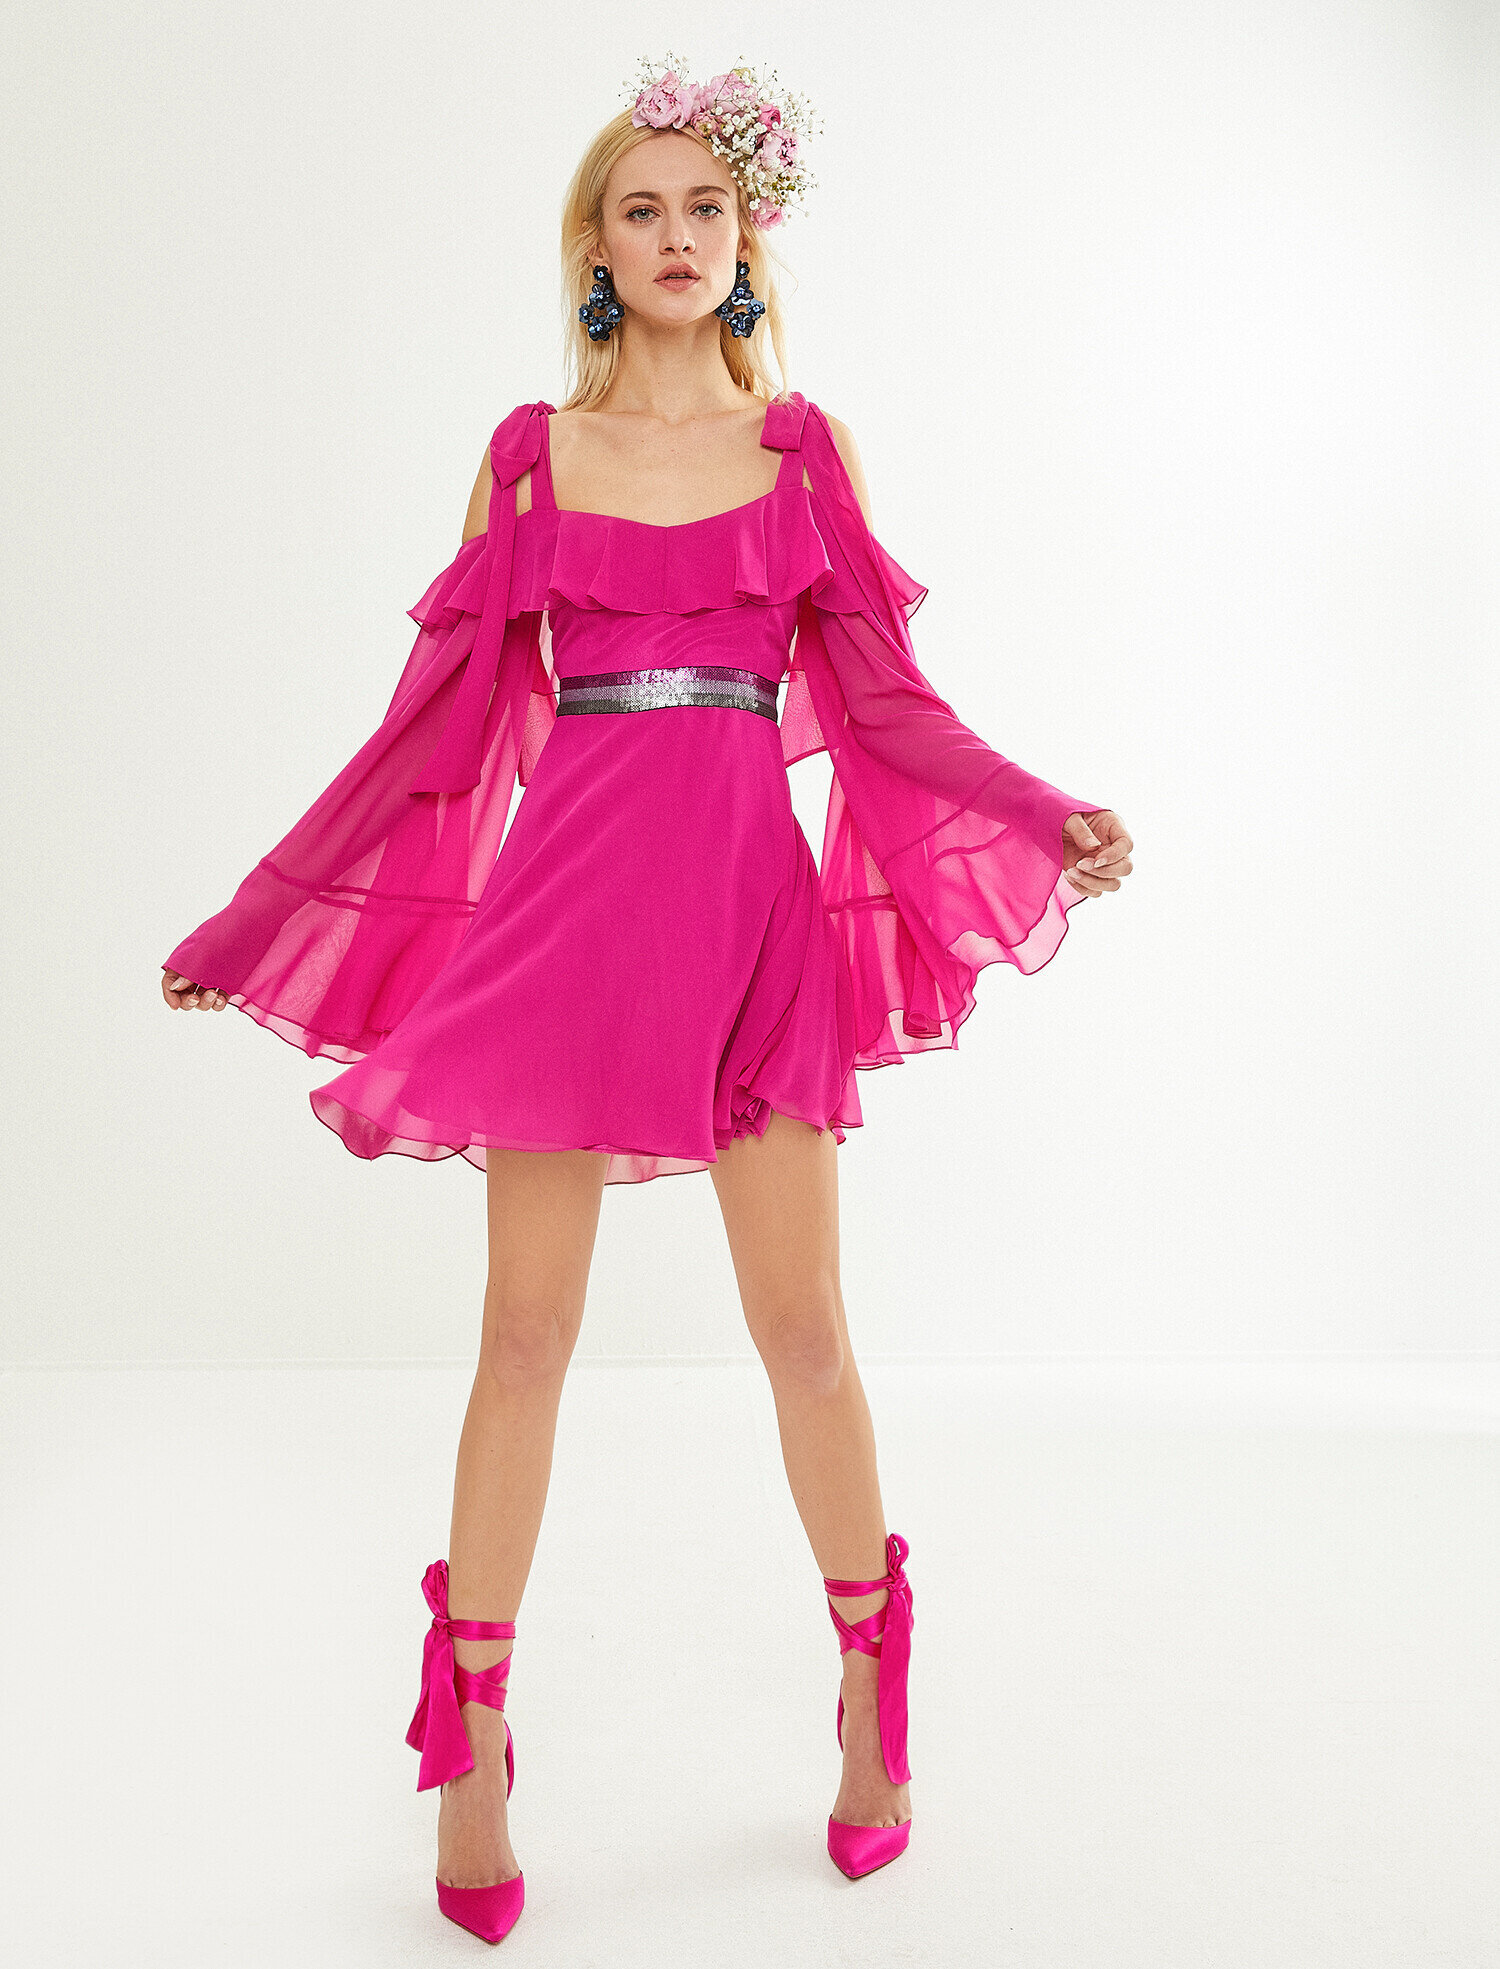 1e31c1cdd585e Pembe Bayan Zeynep Tosun For Koton Elbise 8YAK84083ZW909 | Koton